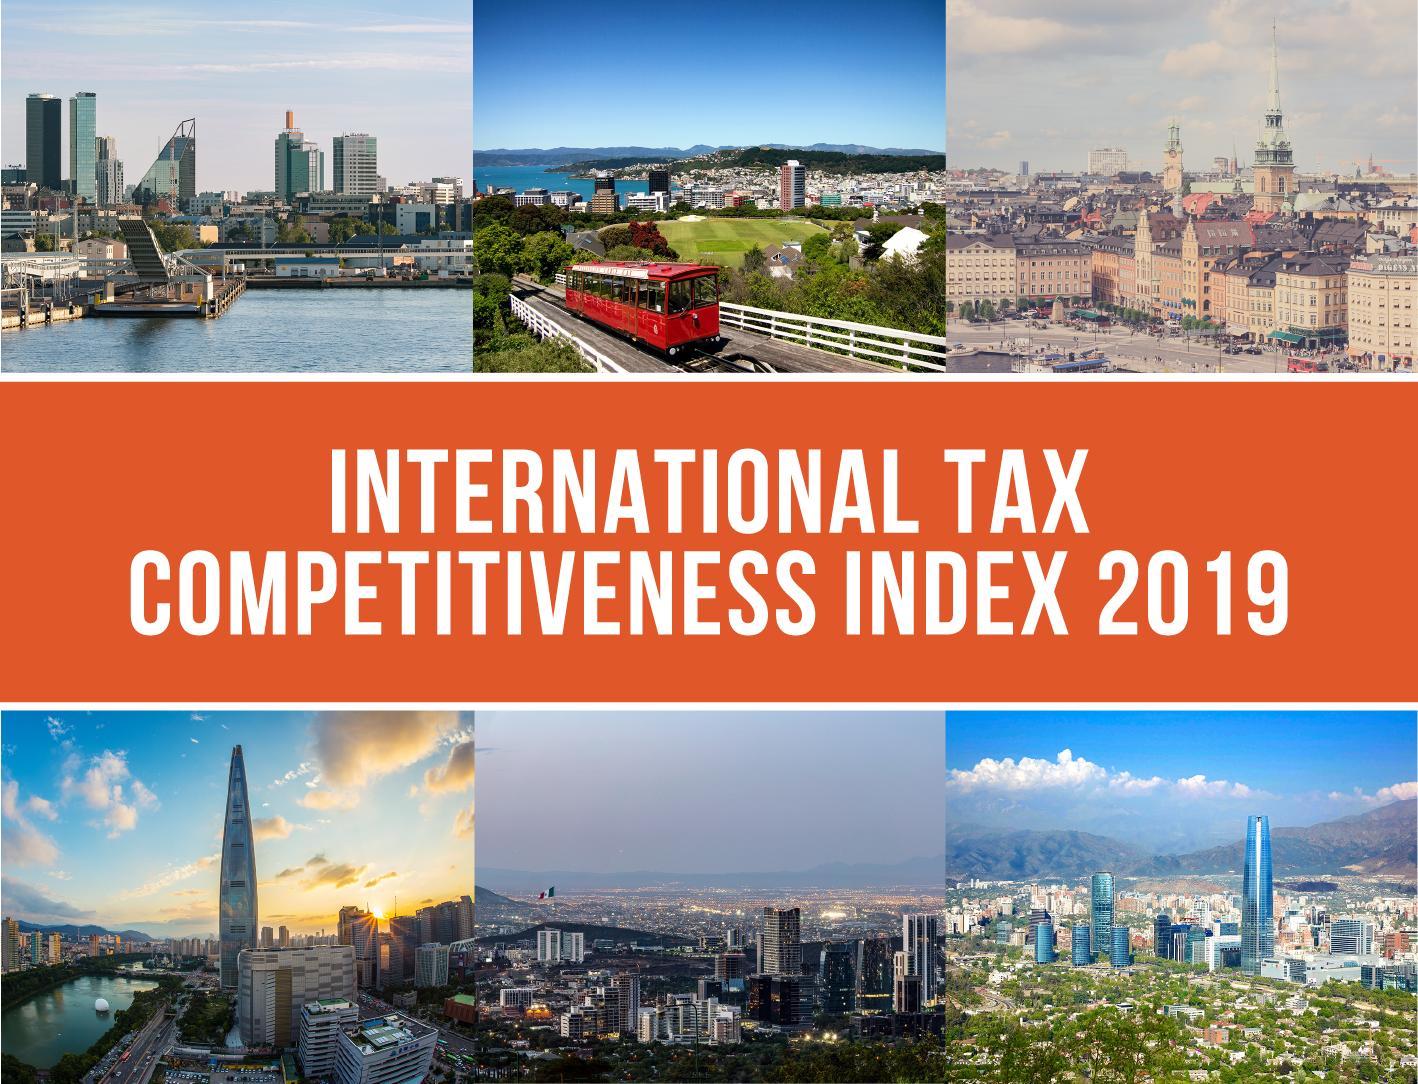 International Tax Competitiveness Index 2019